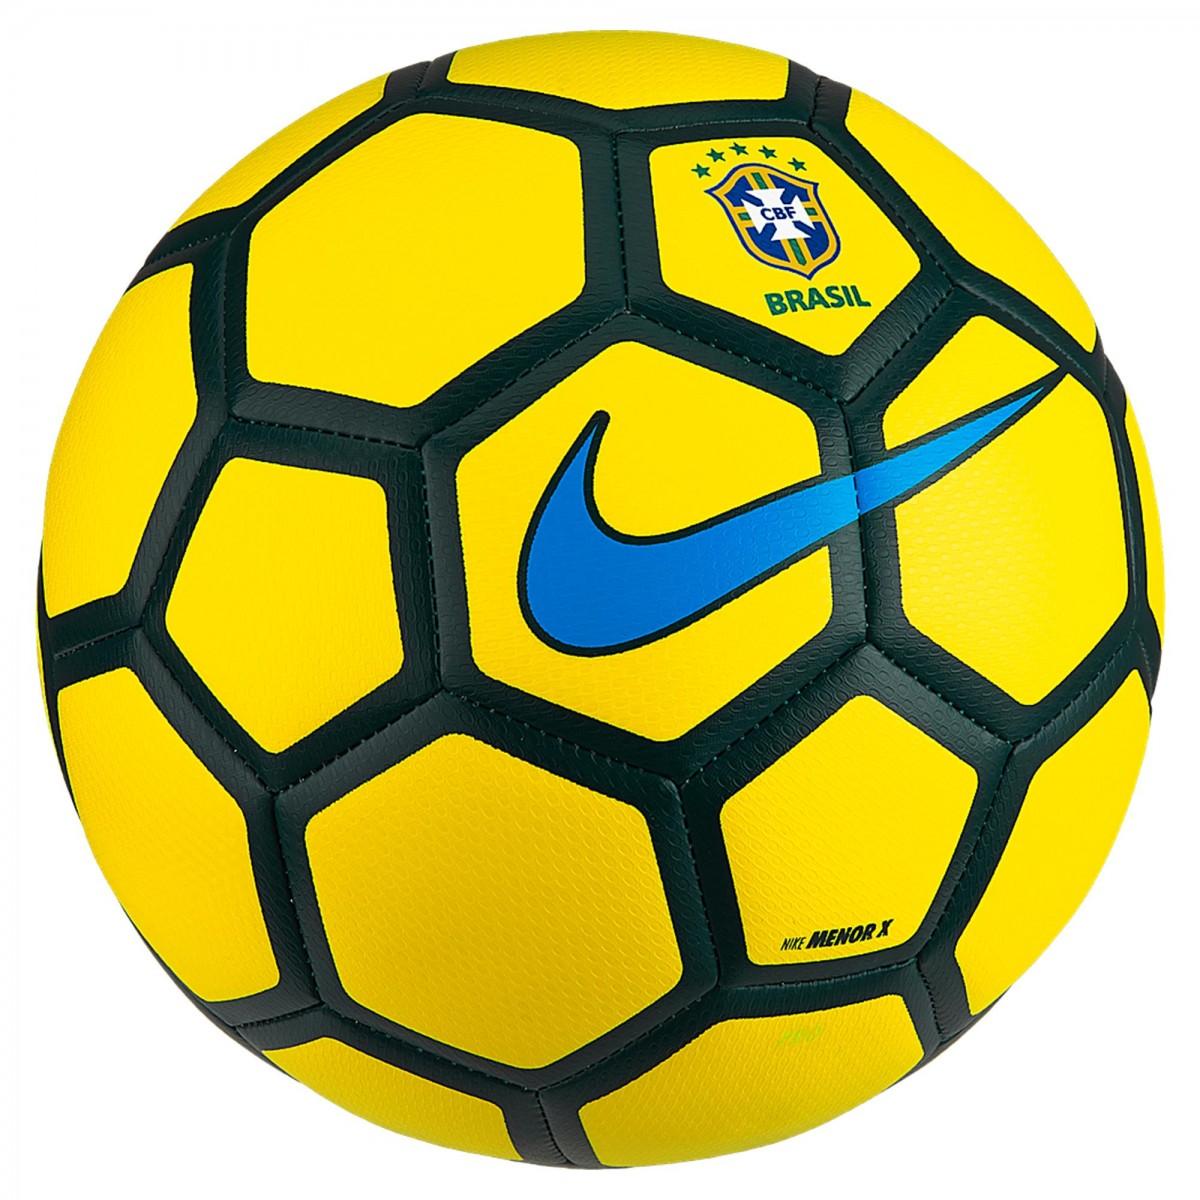 2437ad86a6 Bizz Store - Bola FootballX Menor CBF Futsal Nike Amarela